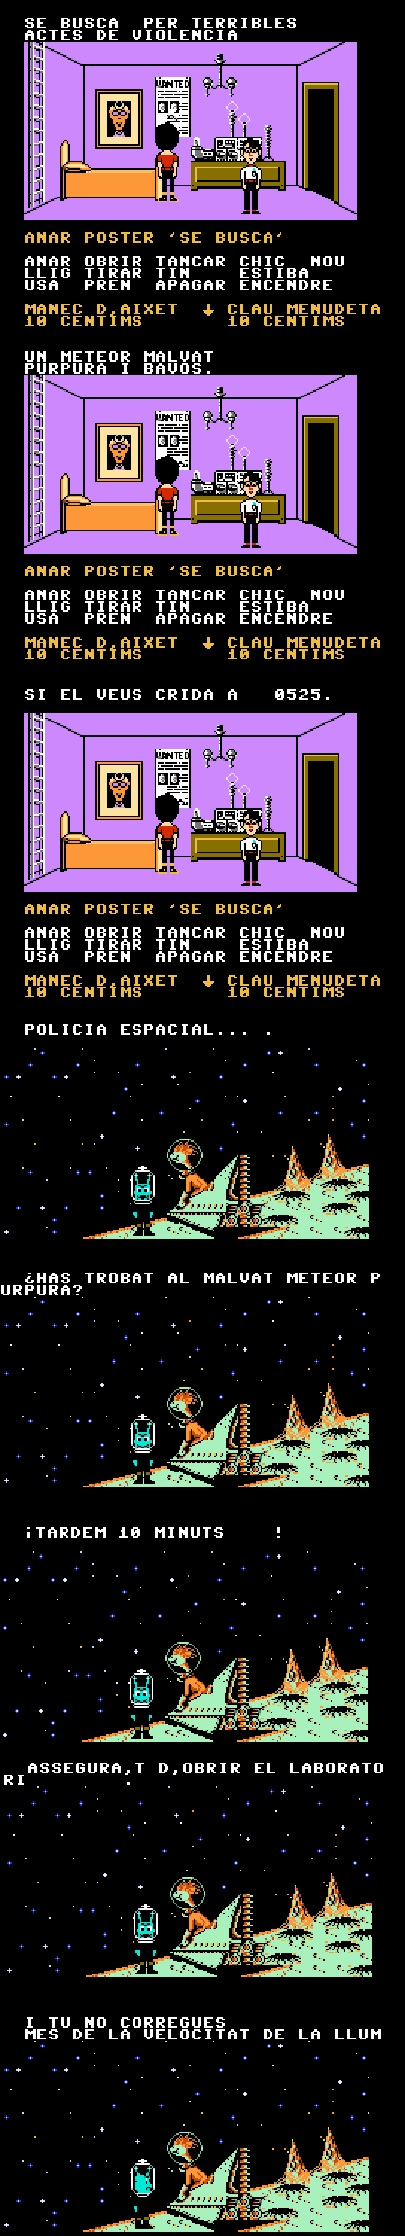 policia_espacial